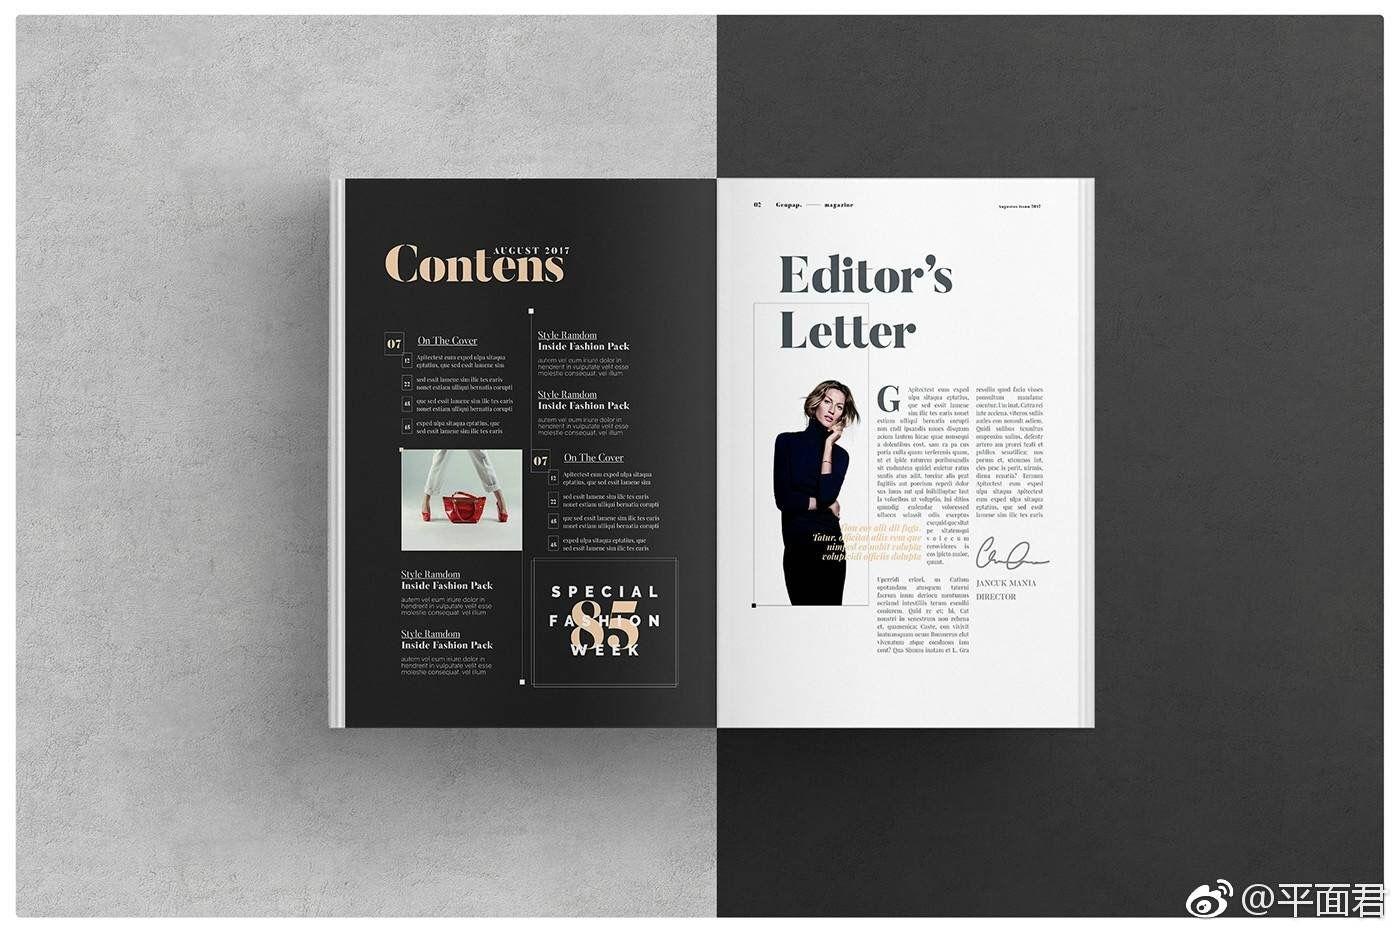 Pin de ricaaaaa en magazine layout | Pinterest